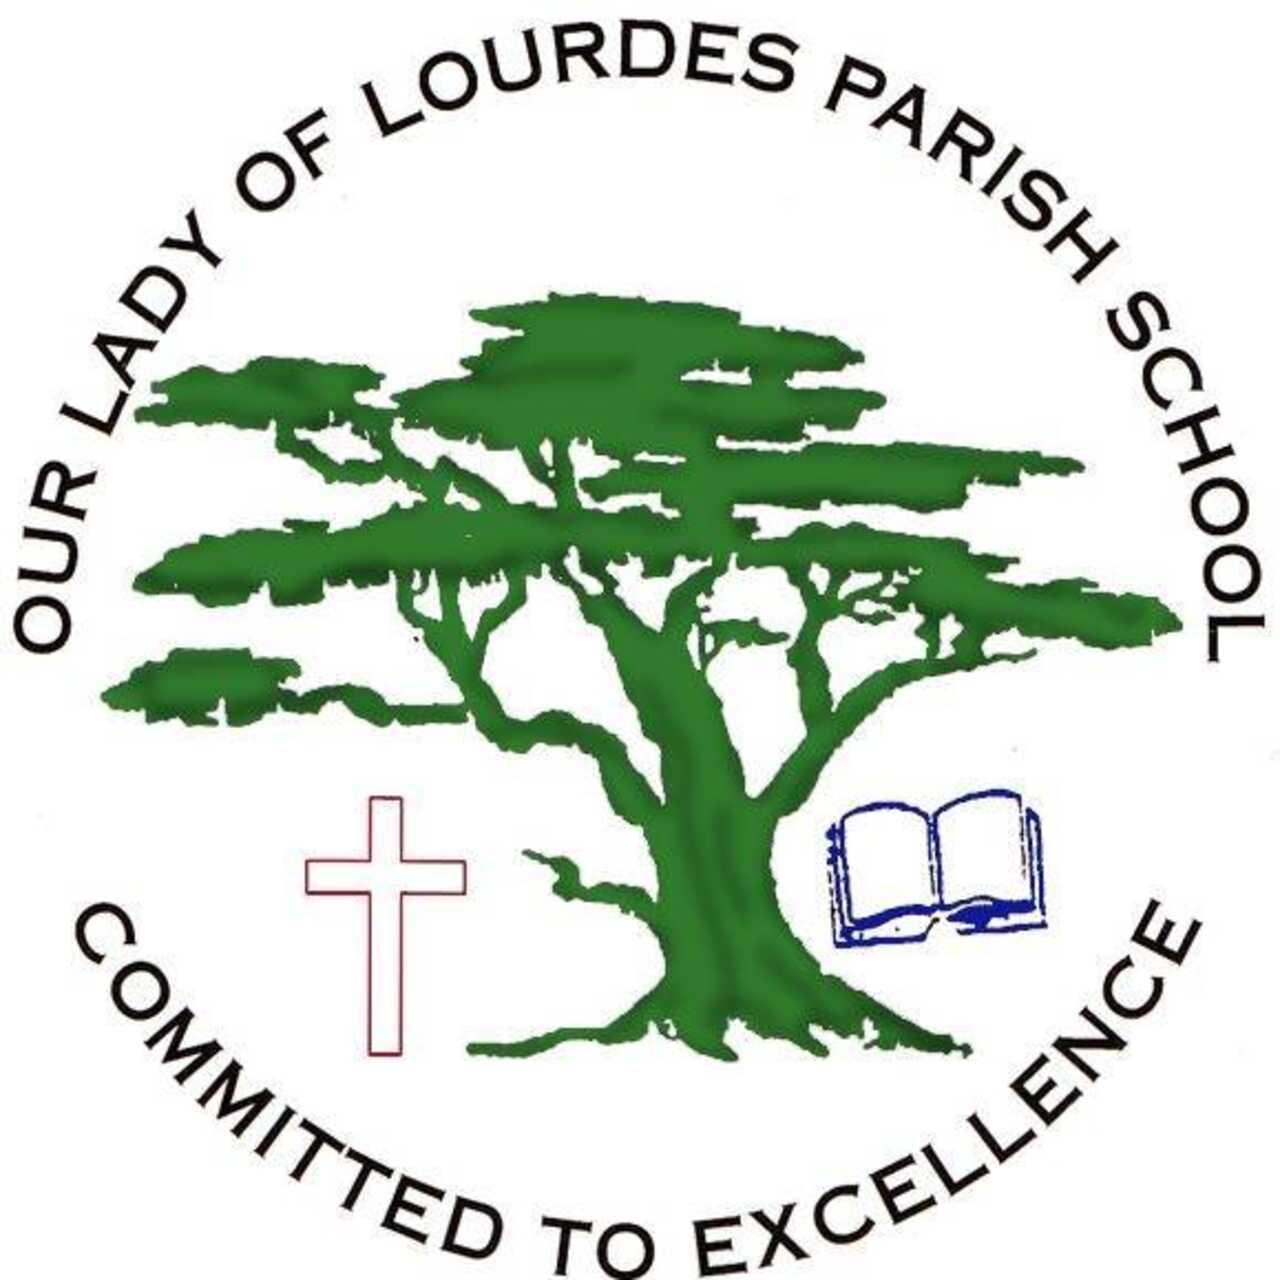 Our Lady of Lourdes Parish School - Education - Preschools in Colusa CA